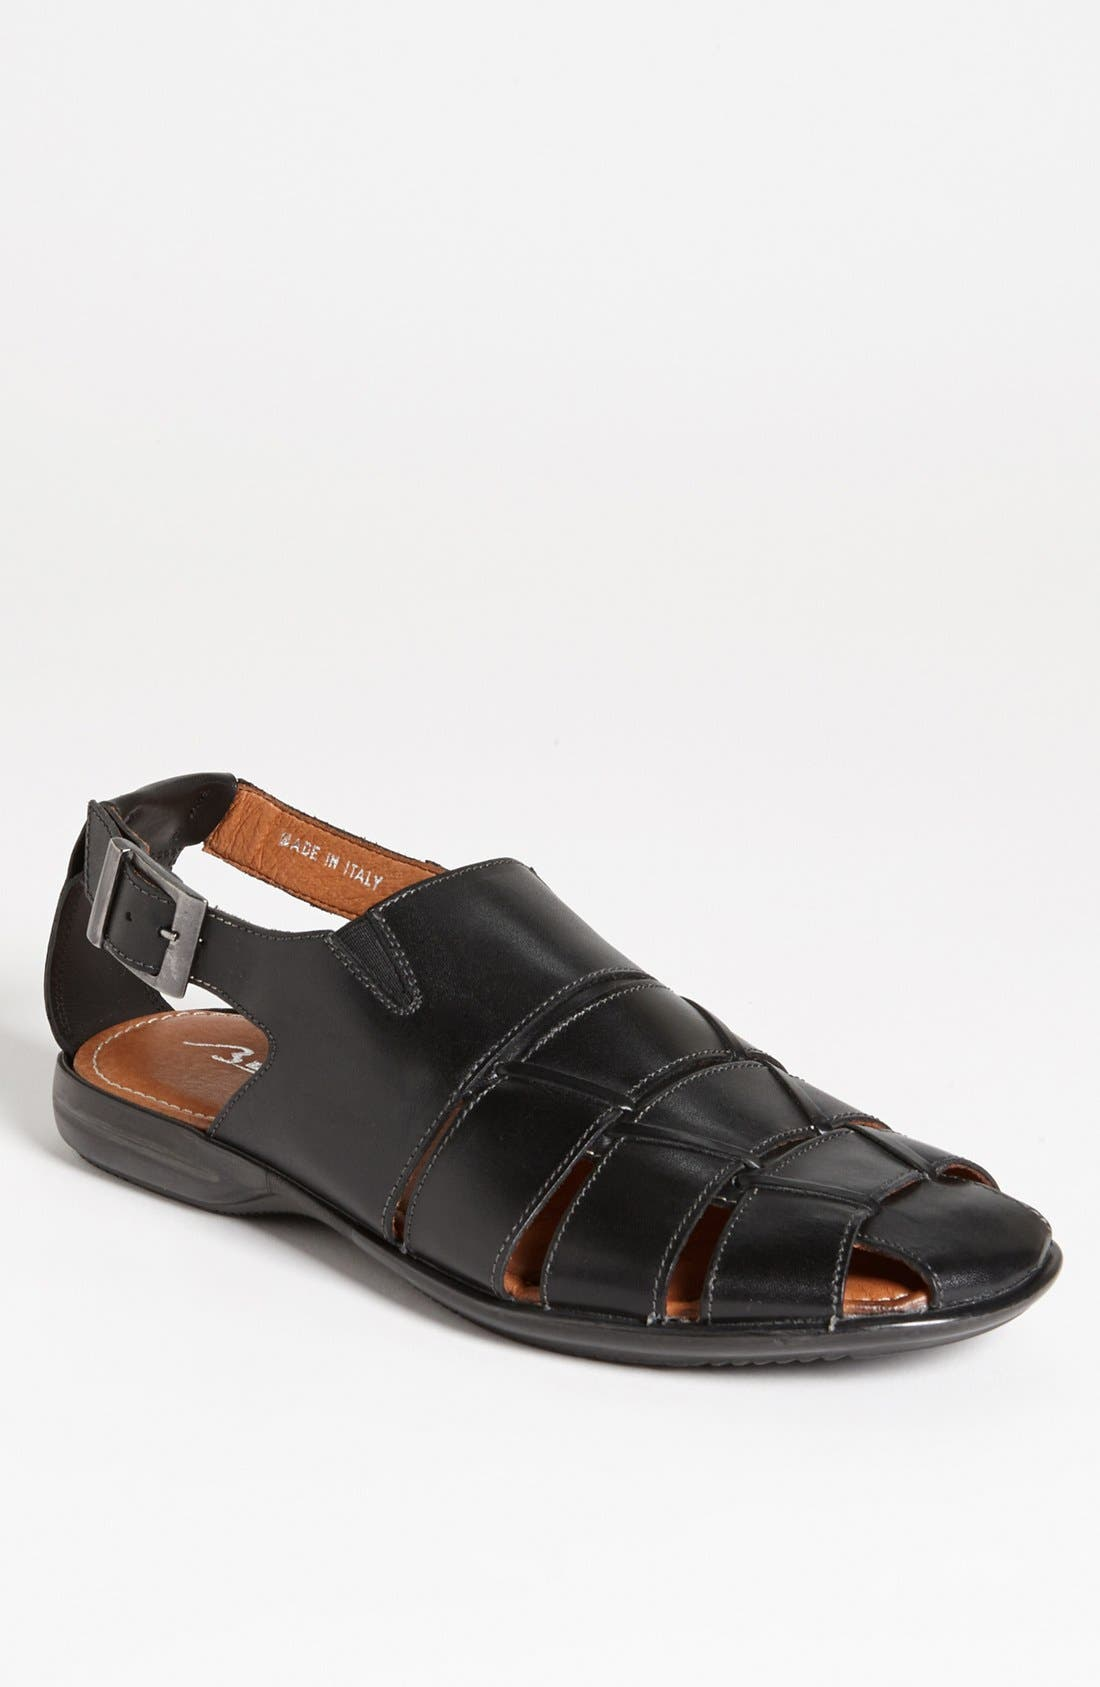 Alternate Image 1 Selected - Bacco Bucci 'Valdano' Sandal (Men)